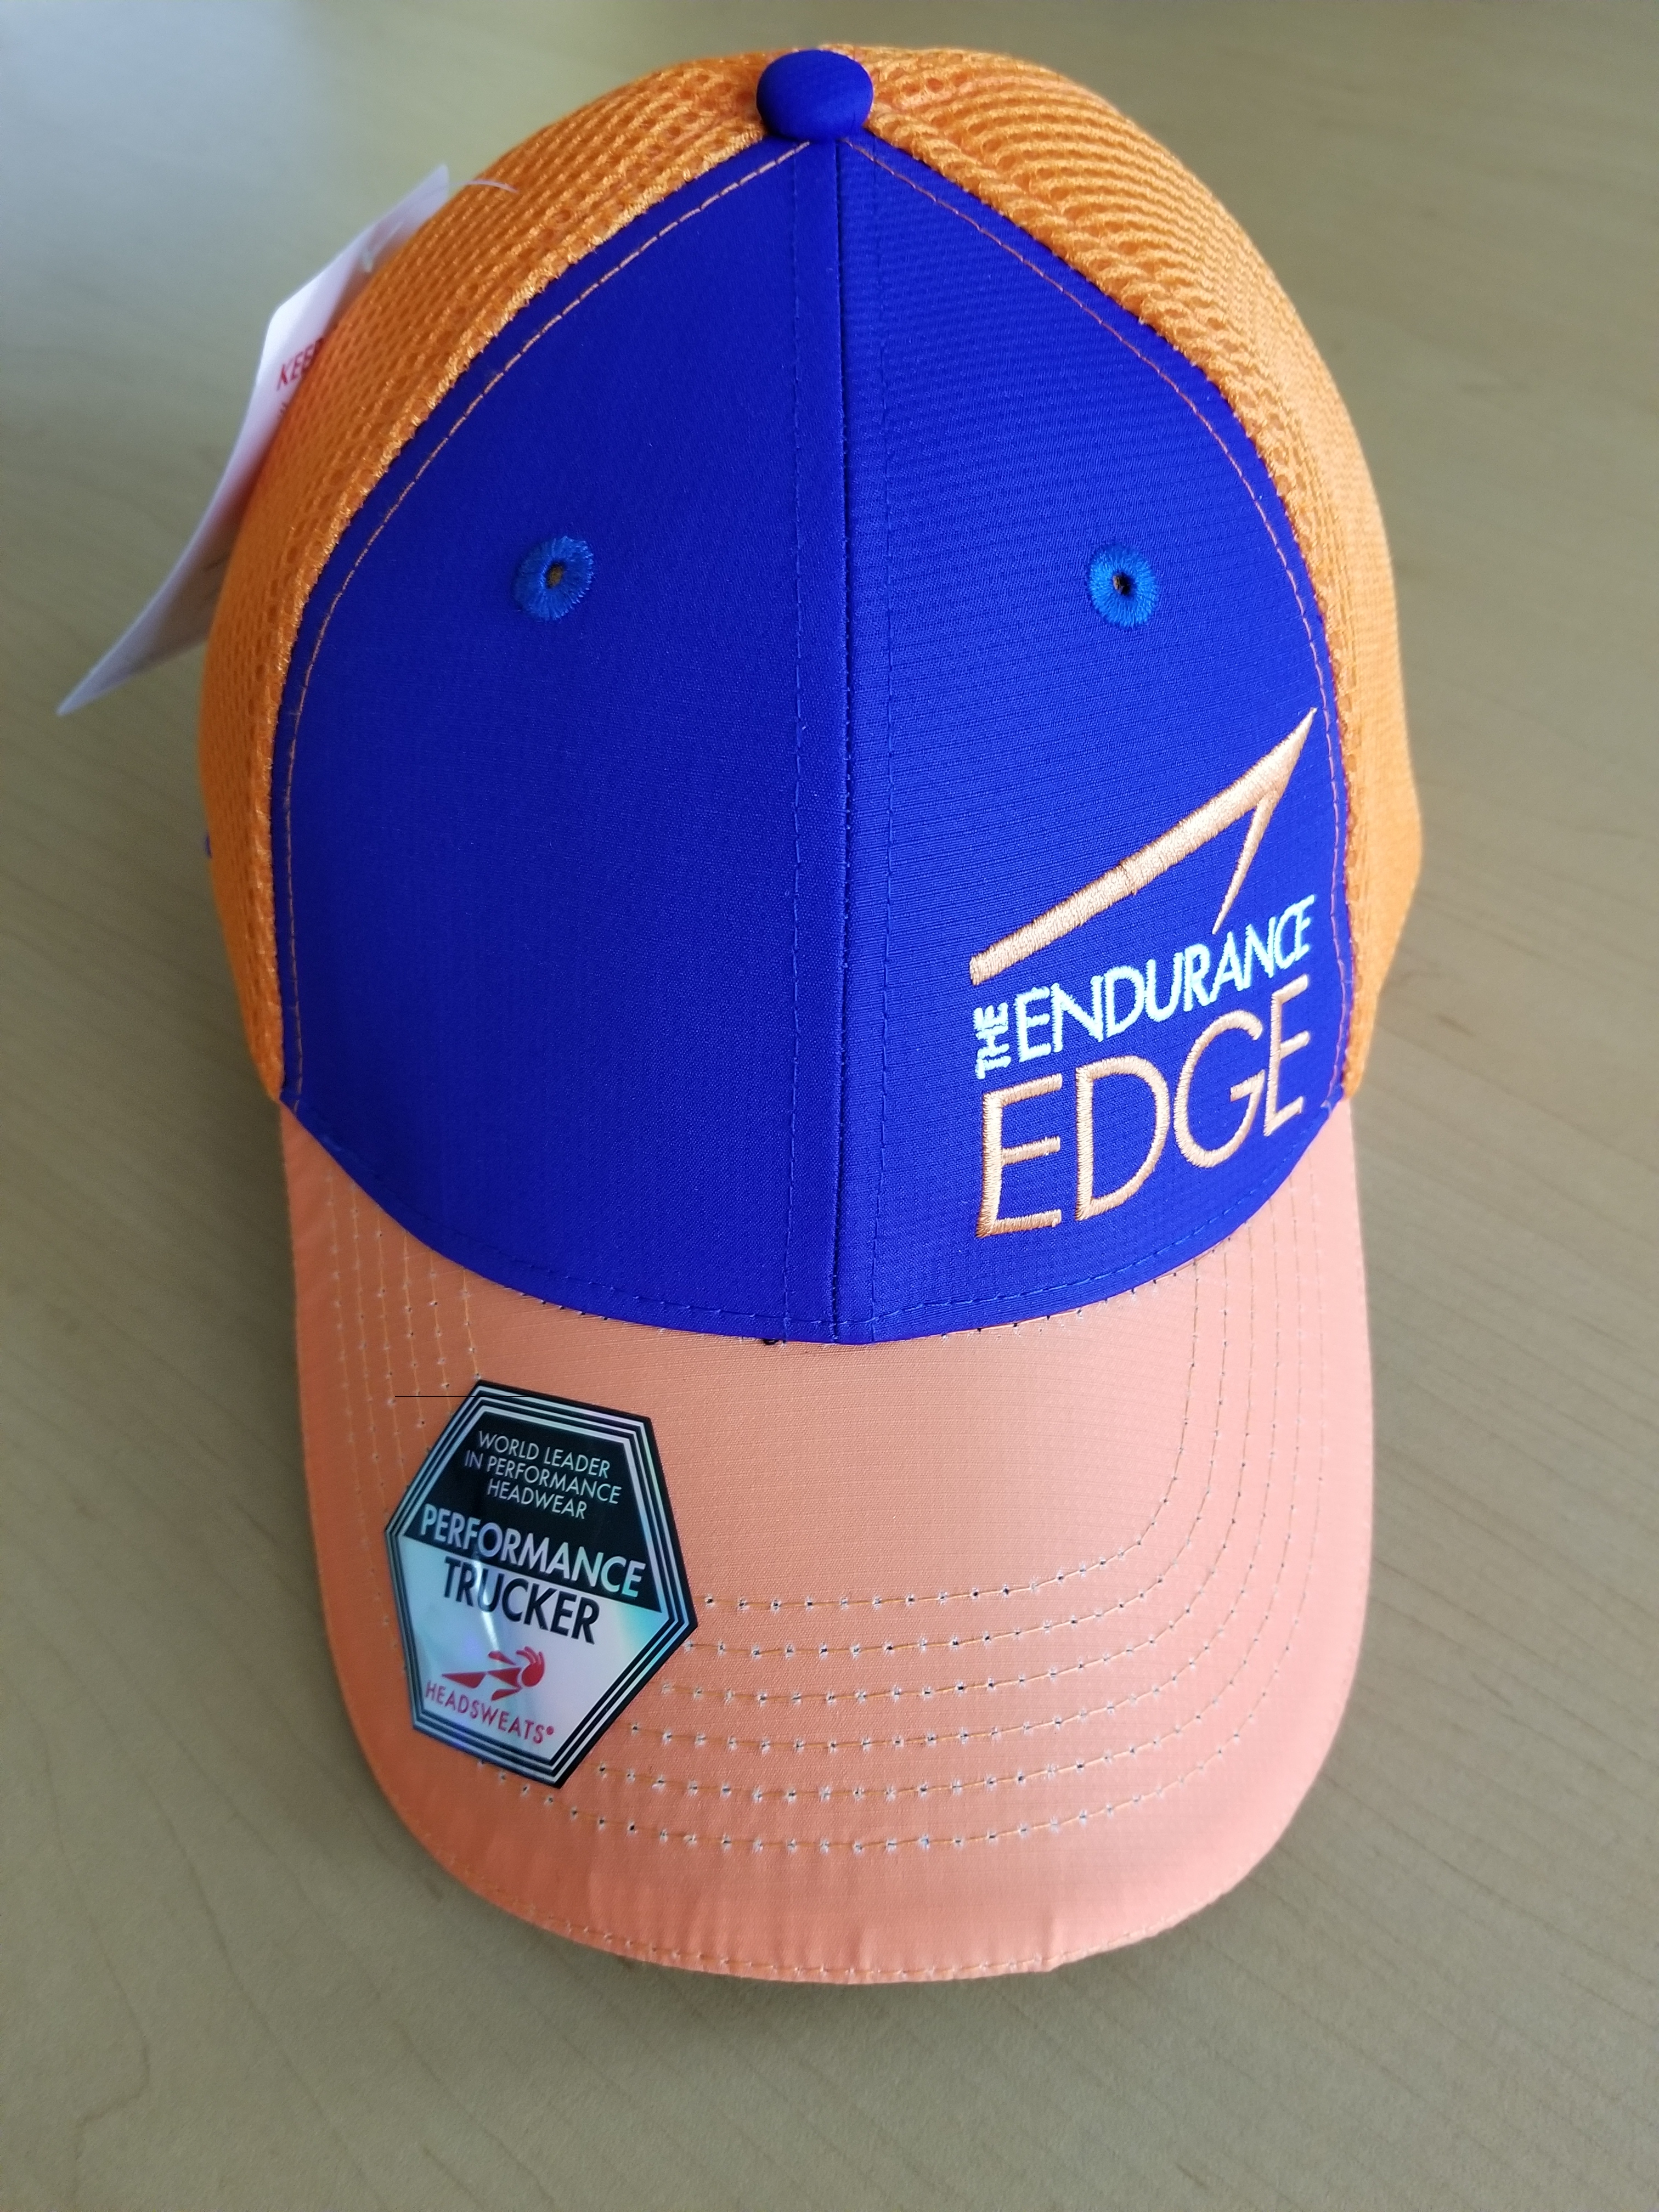 6d318644f7f2e The Endurance Edge Headsweats Trucker